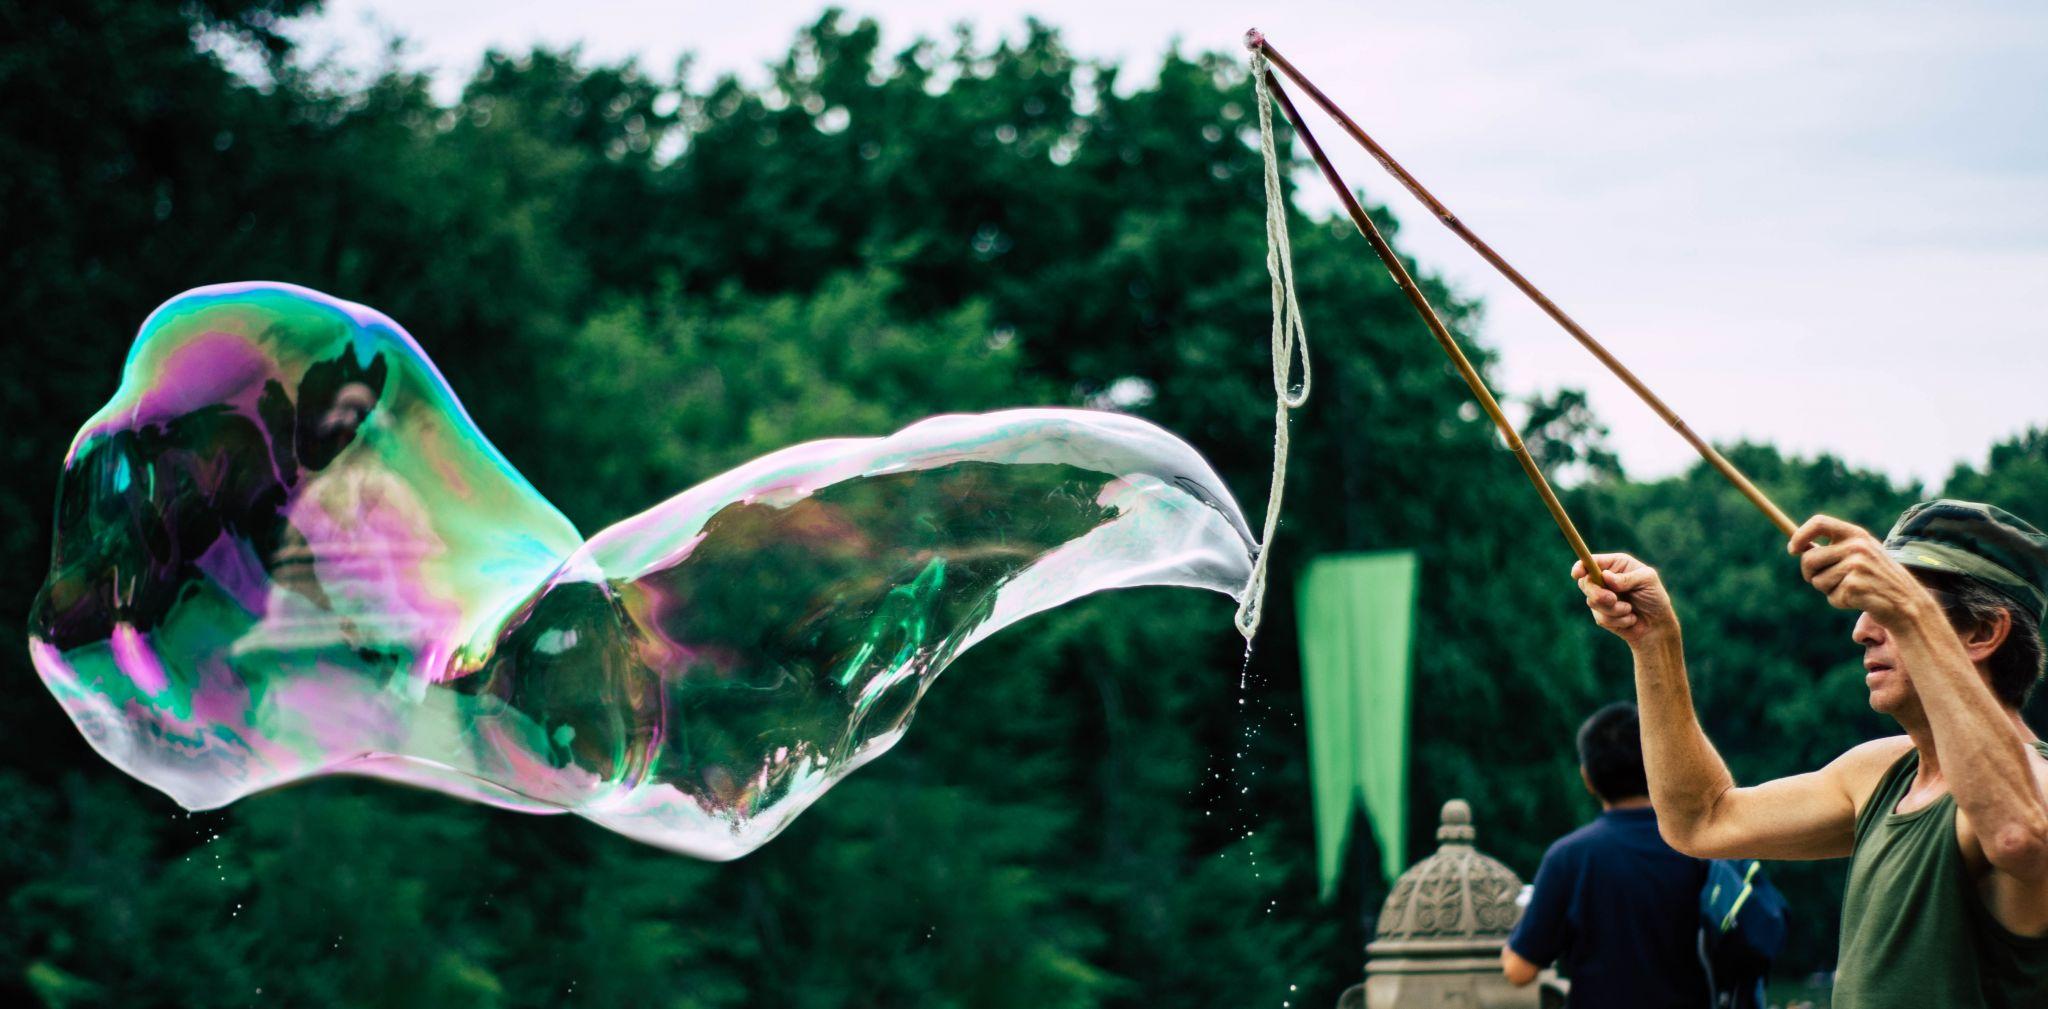 Big Bubble in Central Park, USA